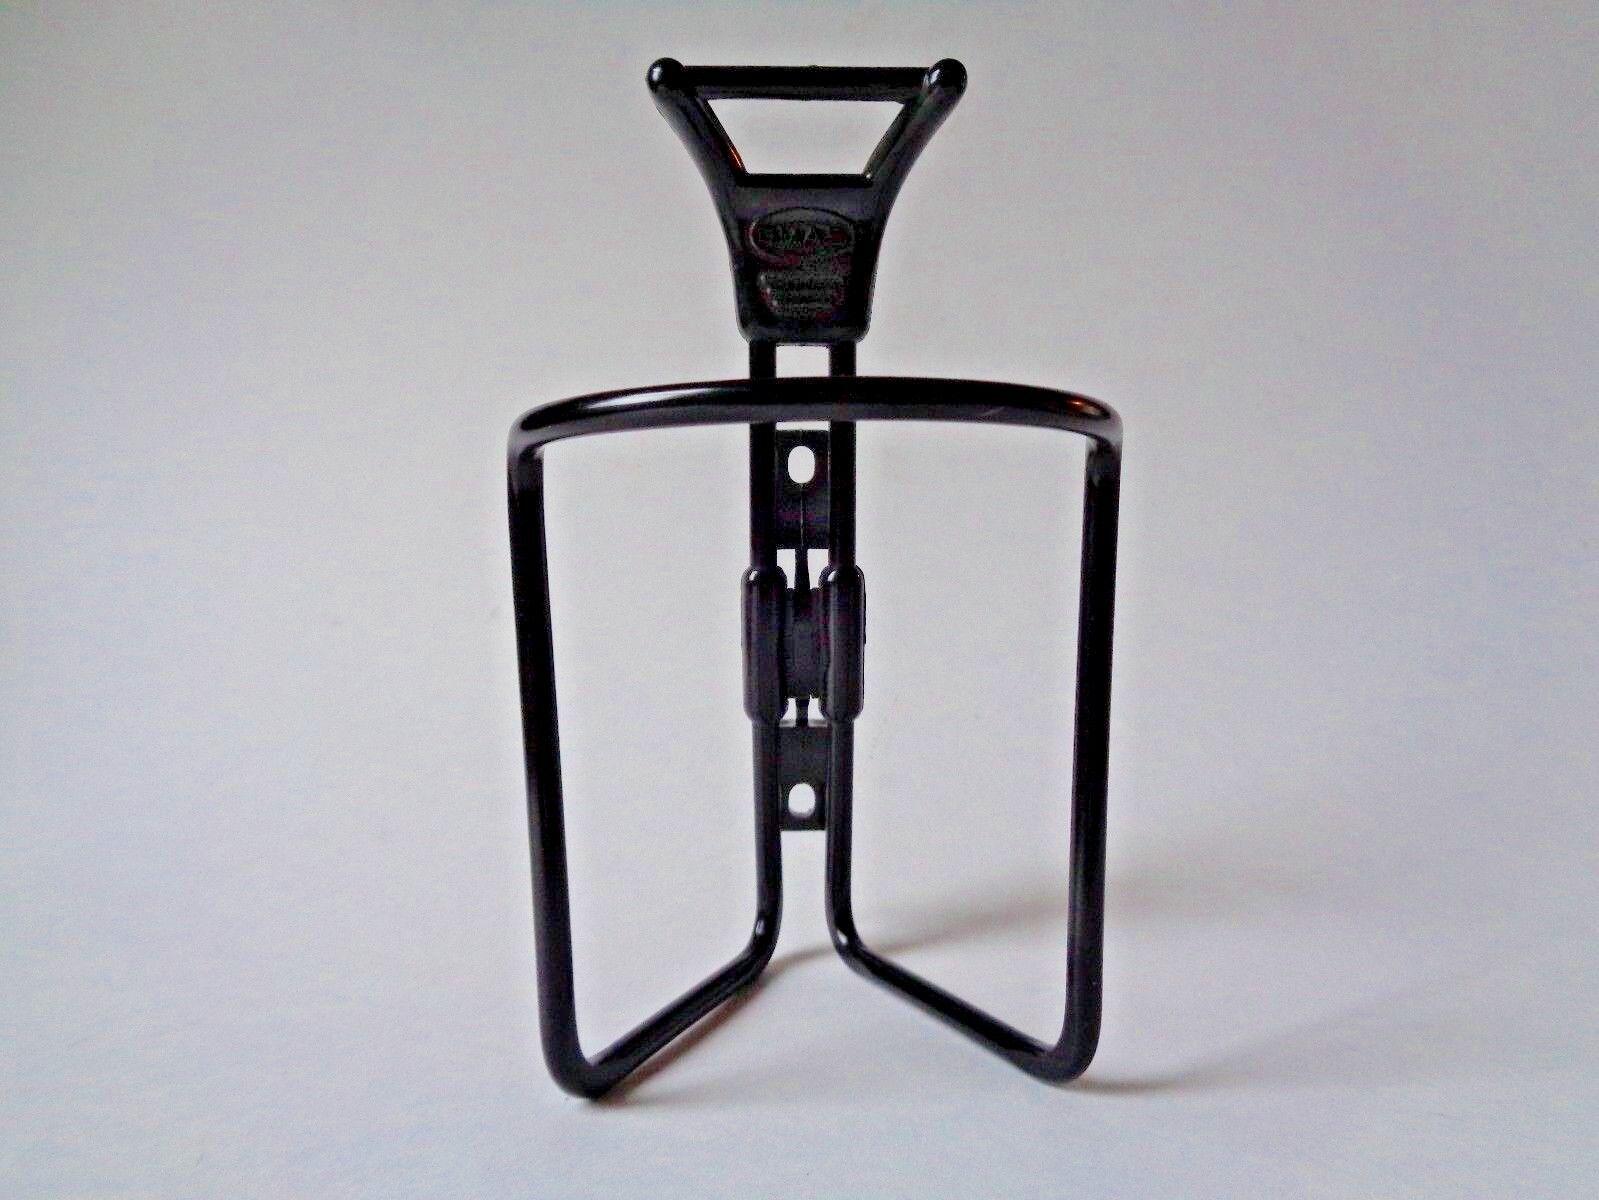 Nos Vintage 1980s OMAS Superleggera in alluminio nero Water Bottle Cage Holder